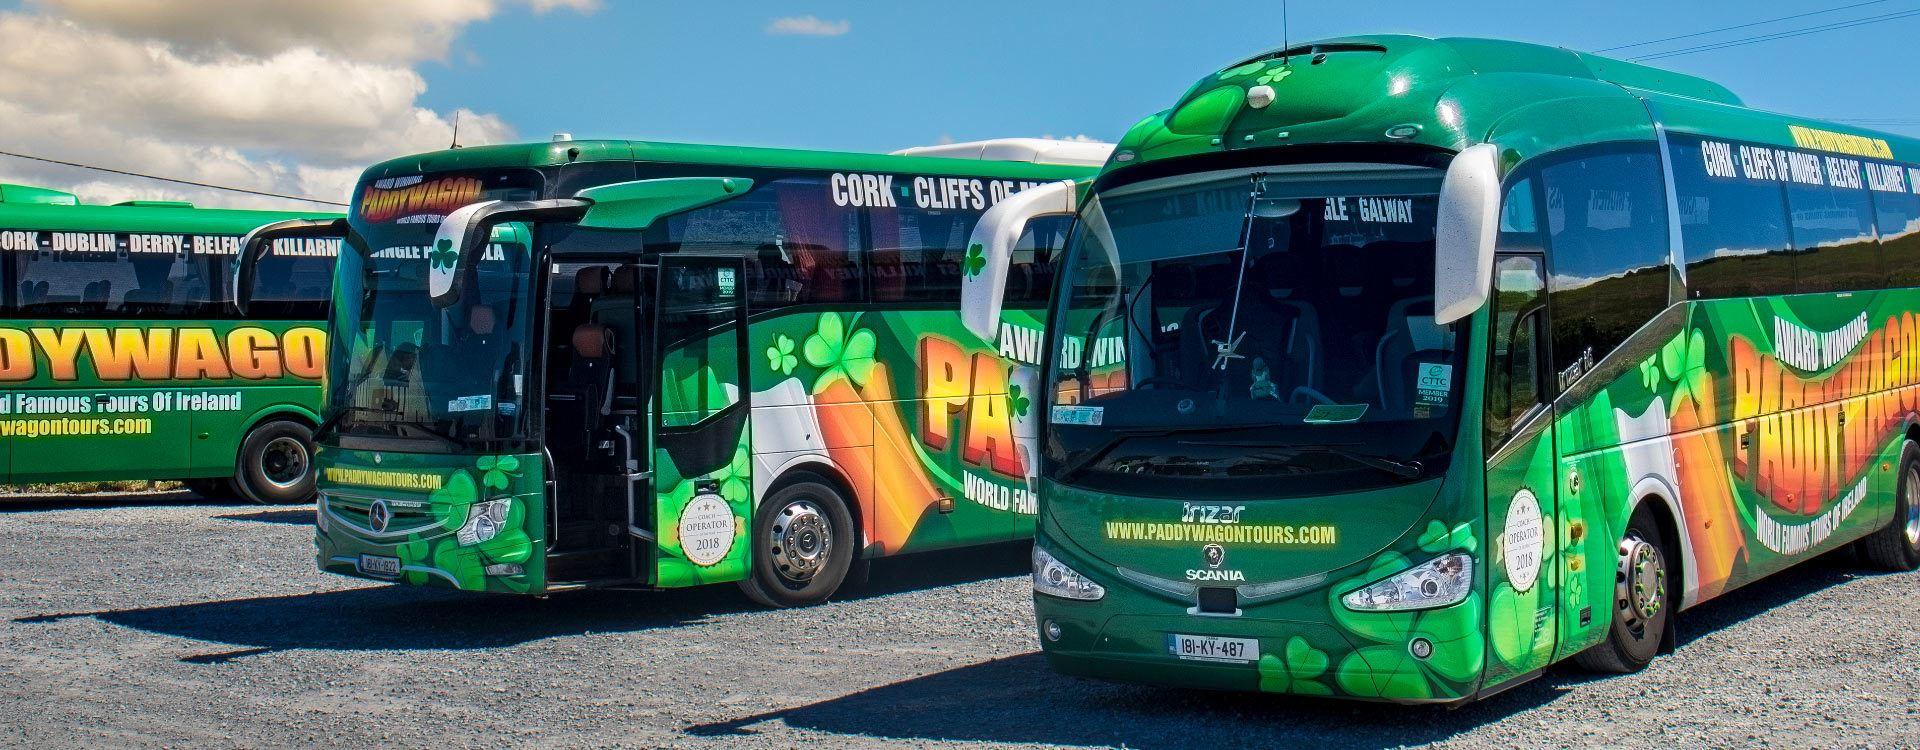 Careers at Paddywagon Tours